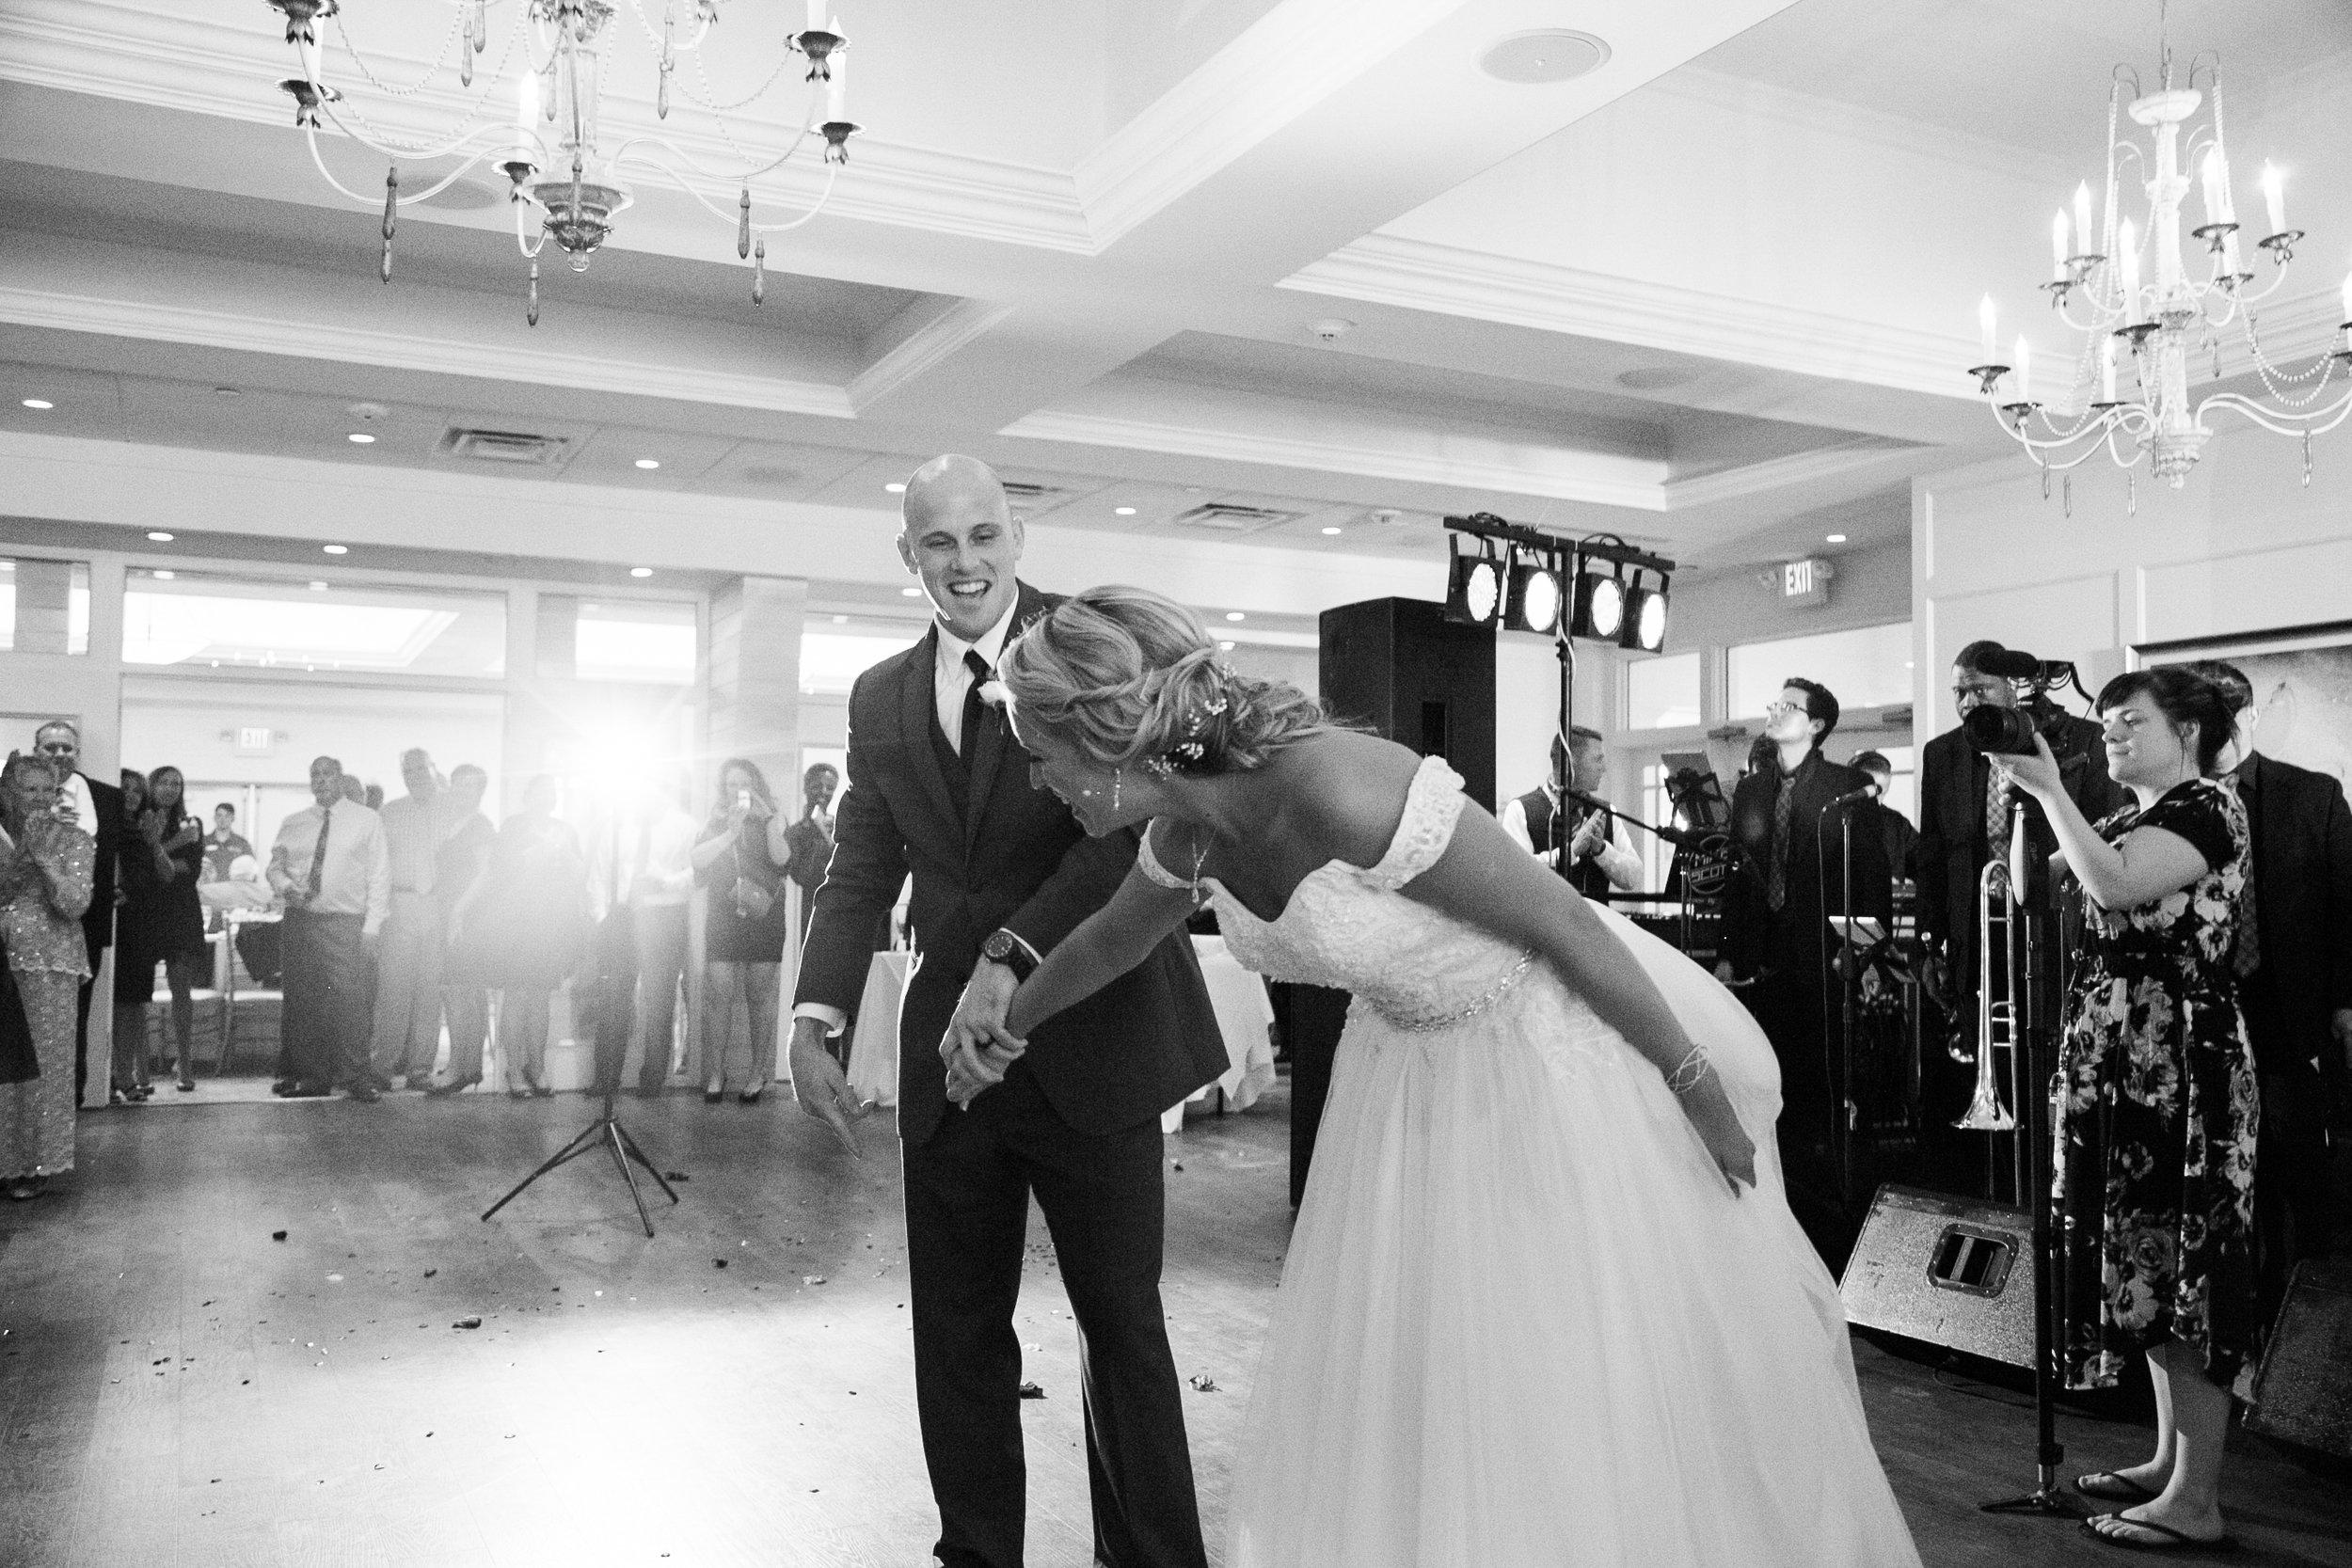 ICONA GOLDEN INN AVALON NJ WEDDING PHOTOGRAPHY  - 074.jpg